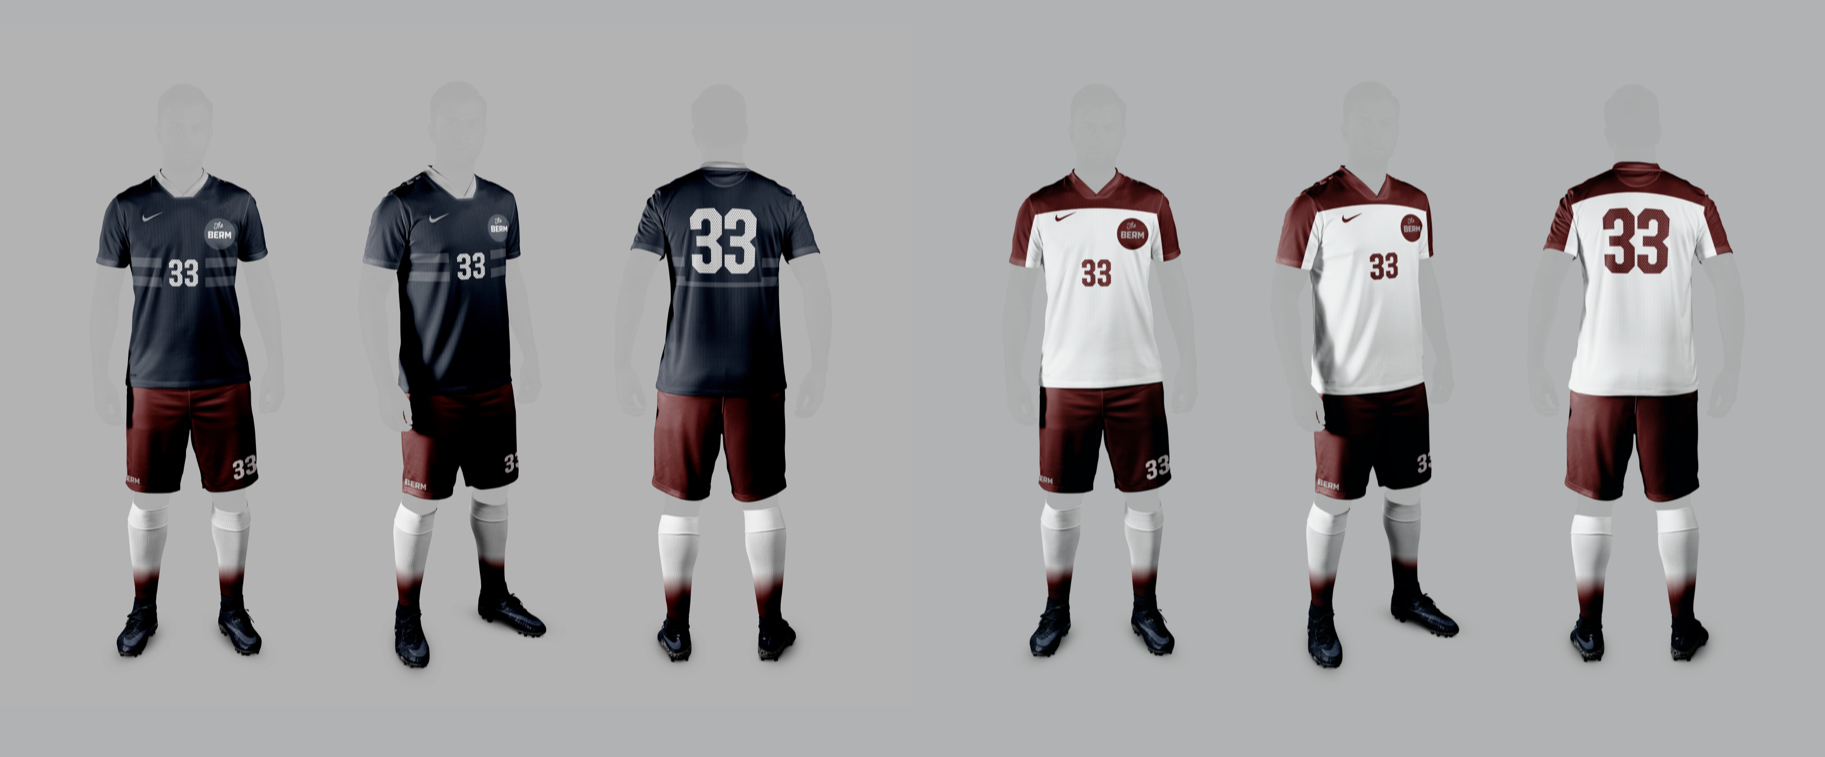 Away and Third soccer uniform